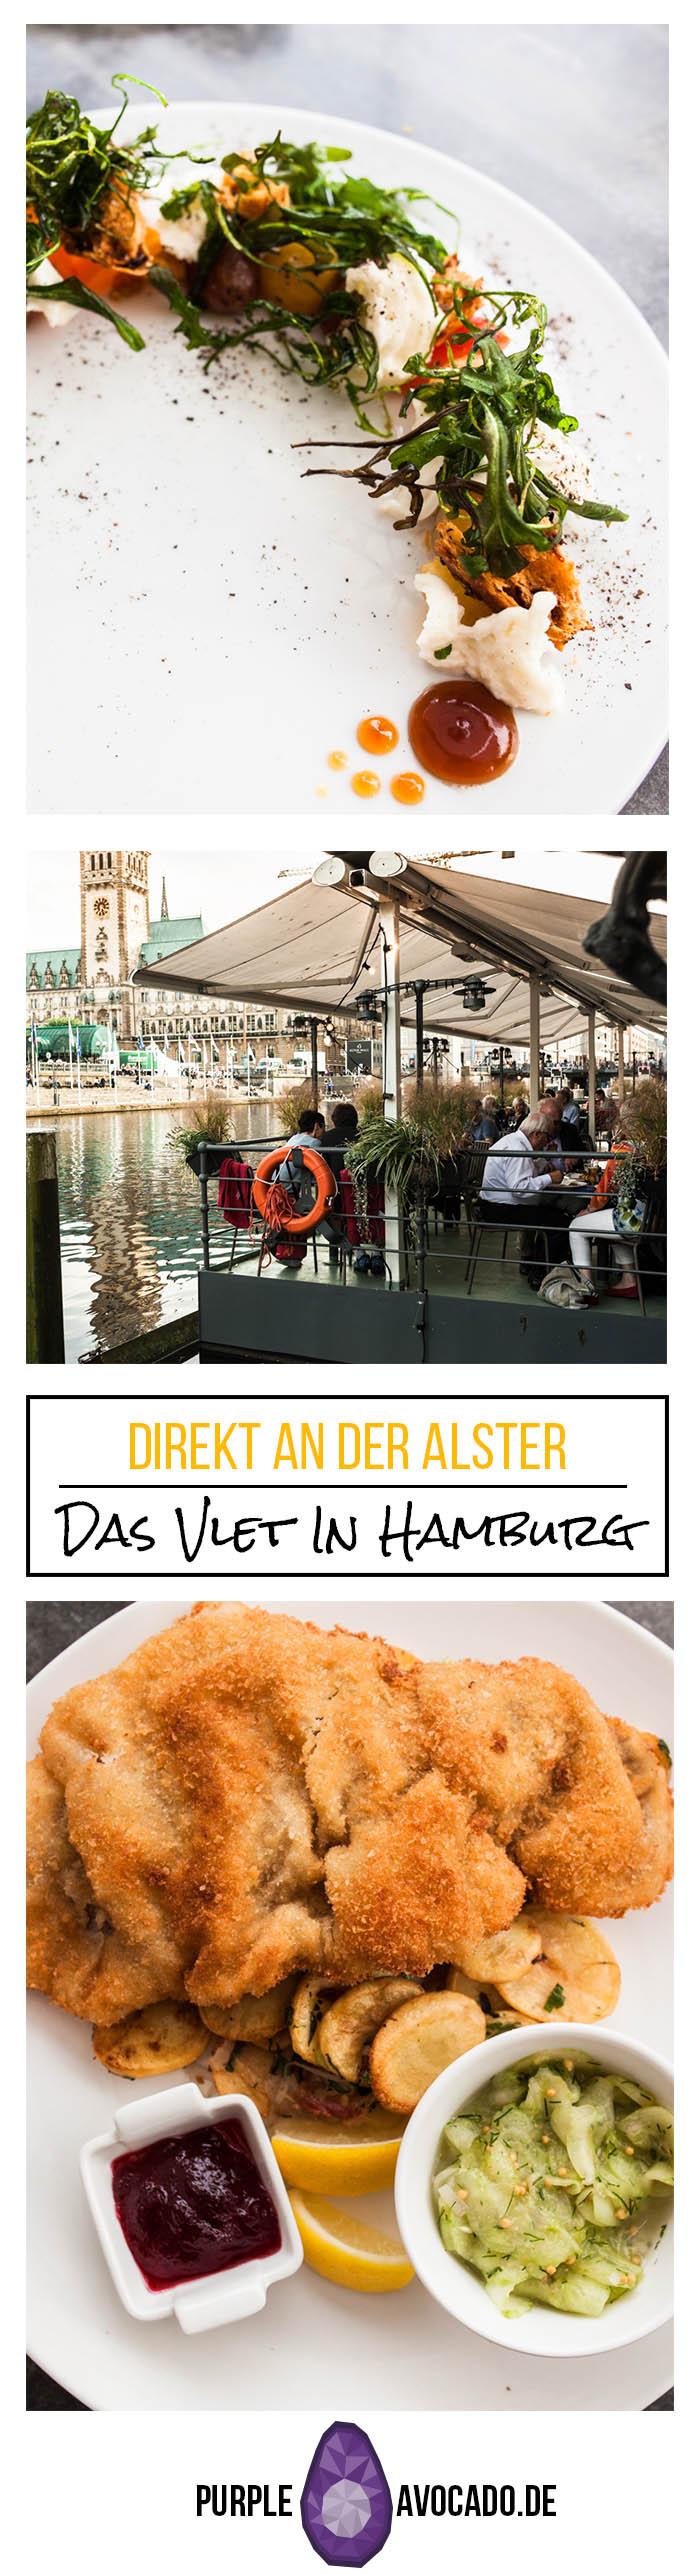 Hamburger Küche Restaurant: Bar